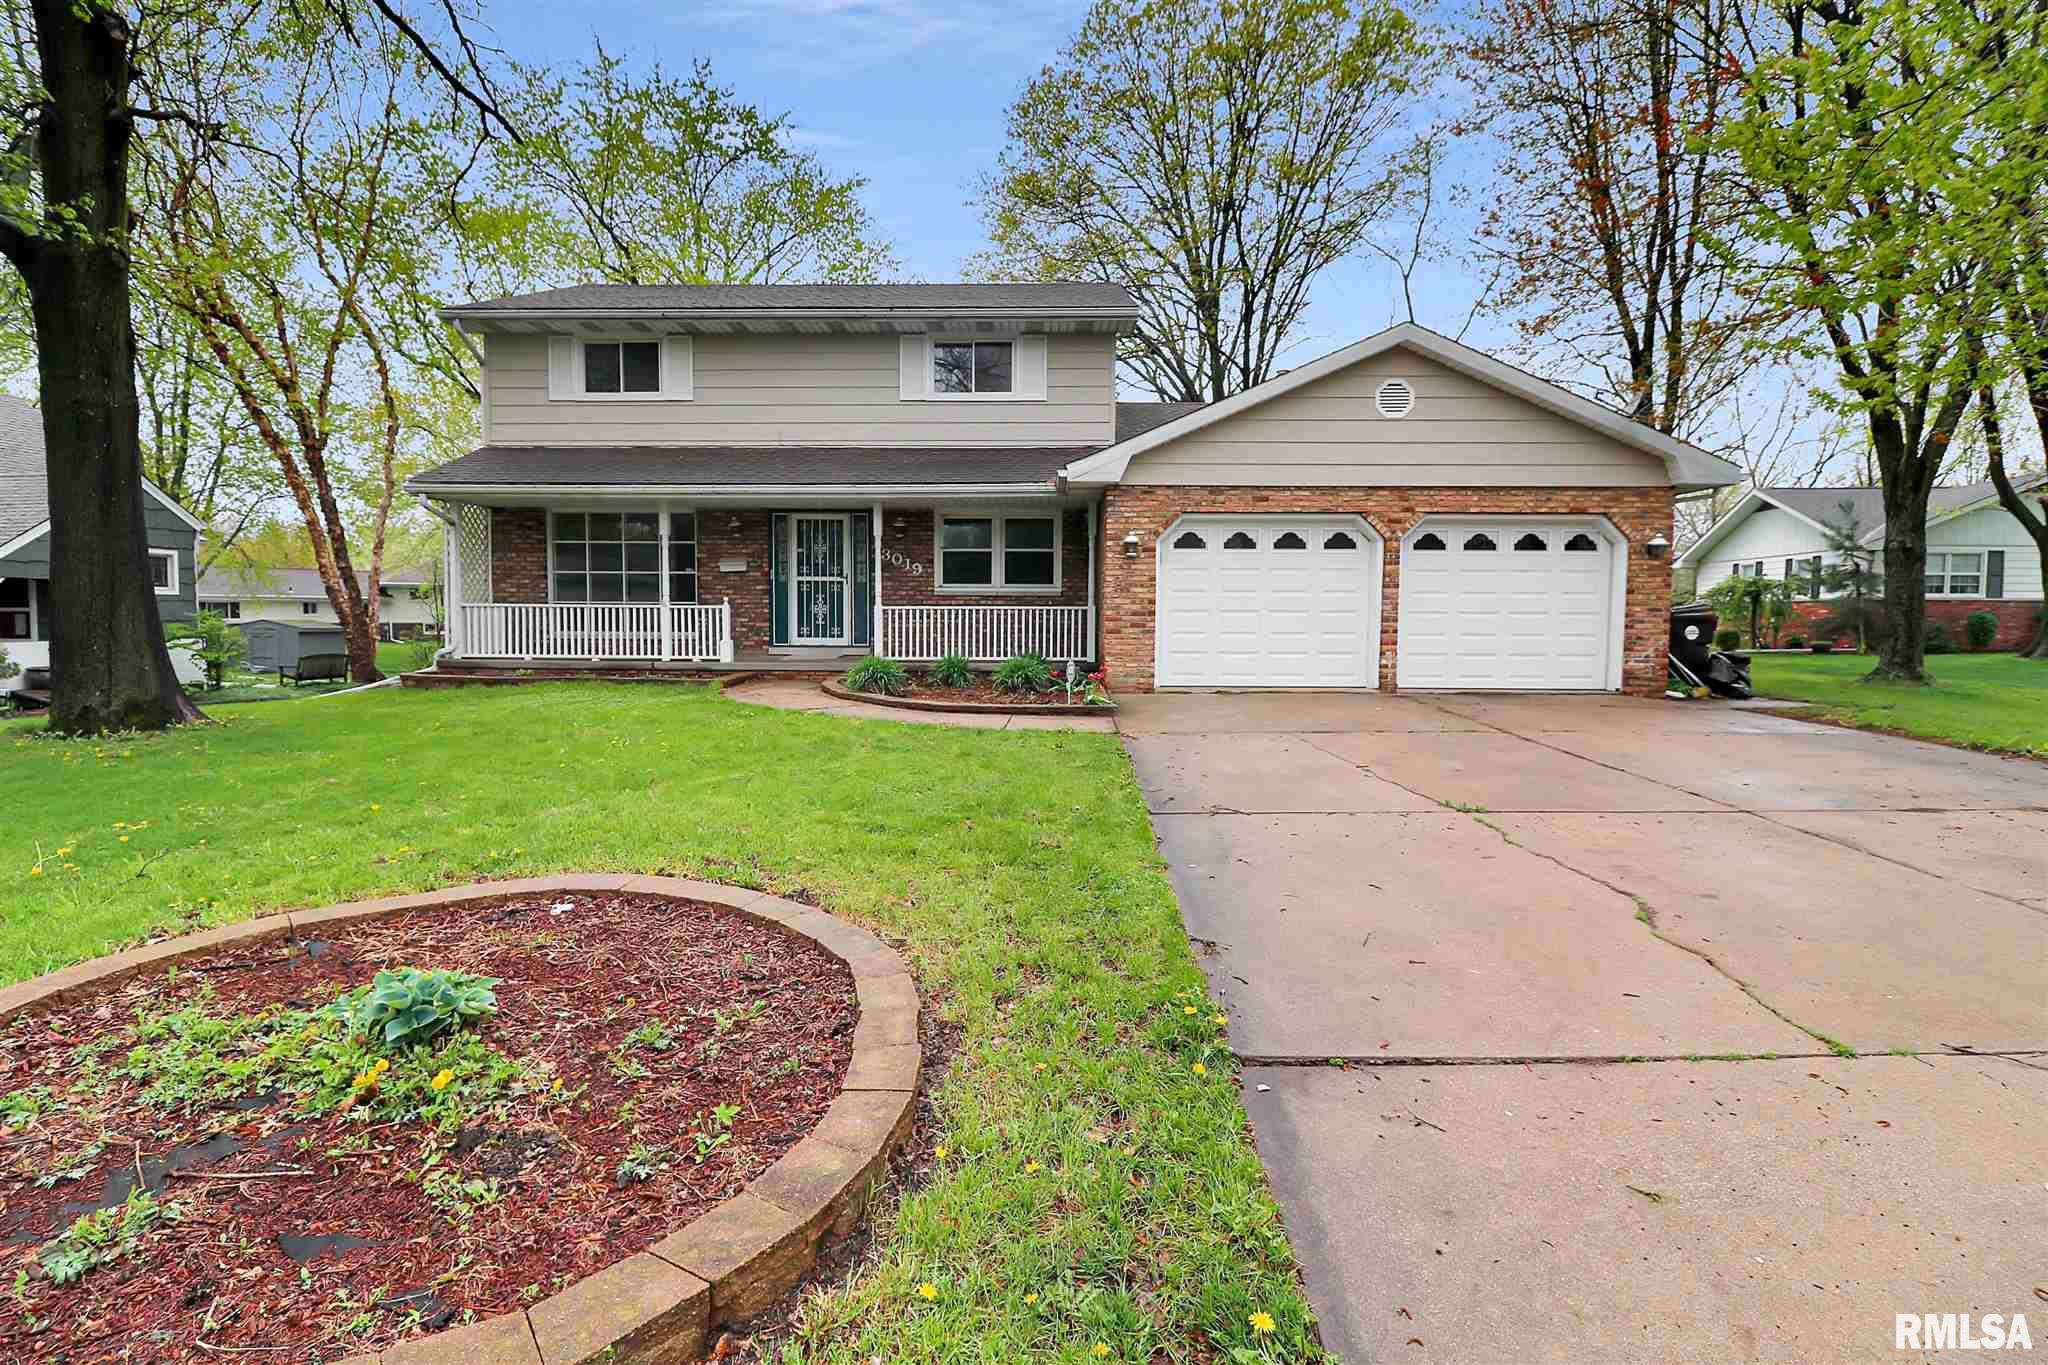 3019 N LEHMAN Property Photo - Peoria, IL real estate listing